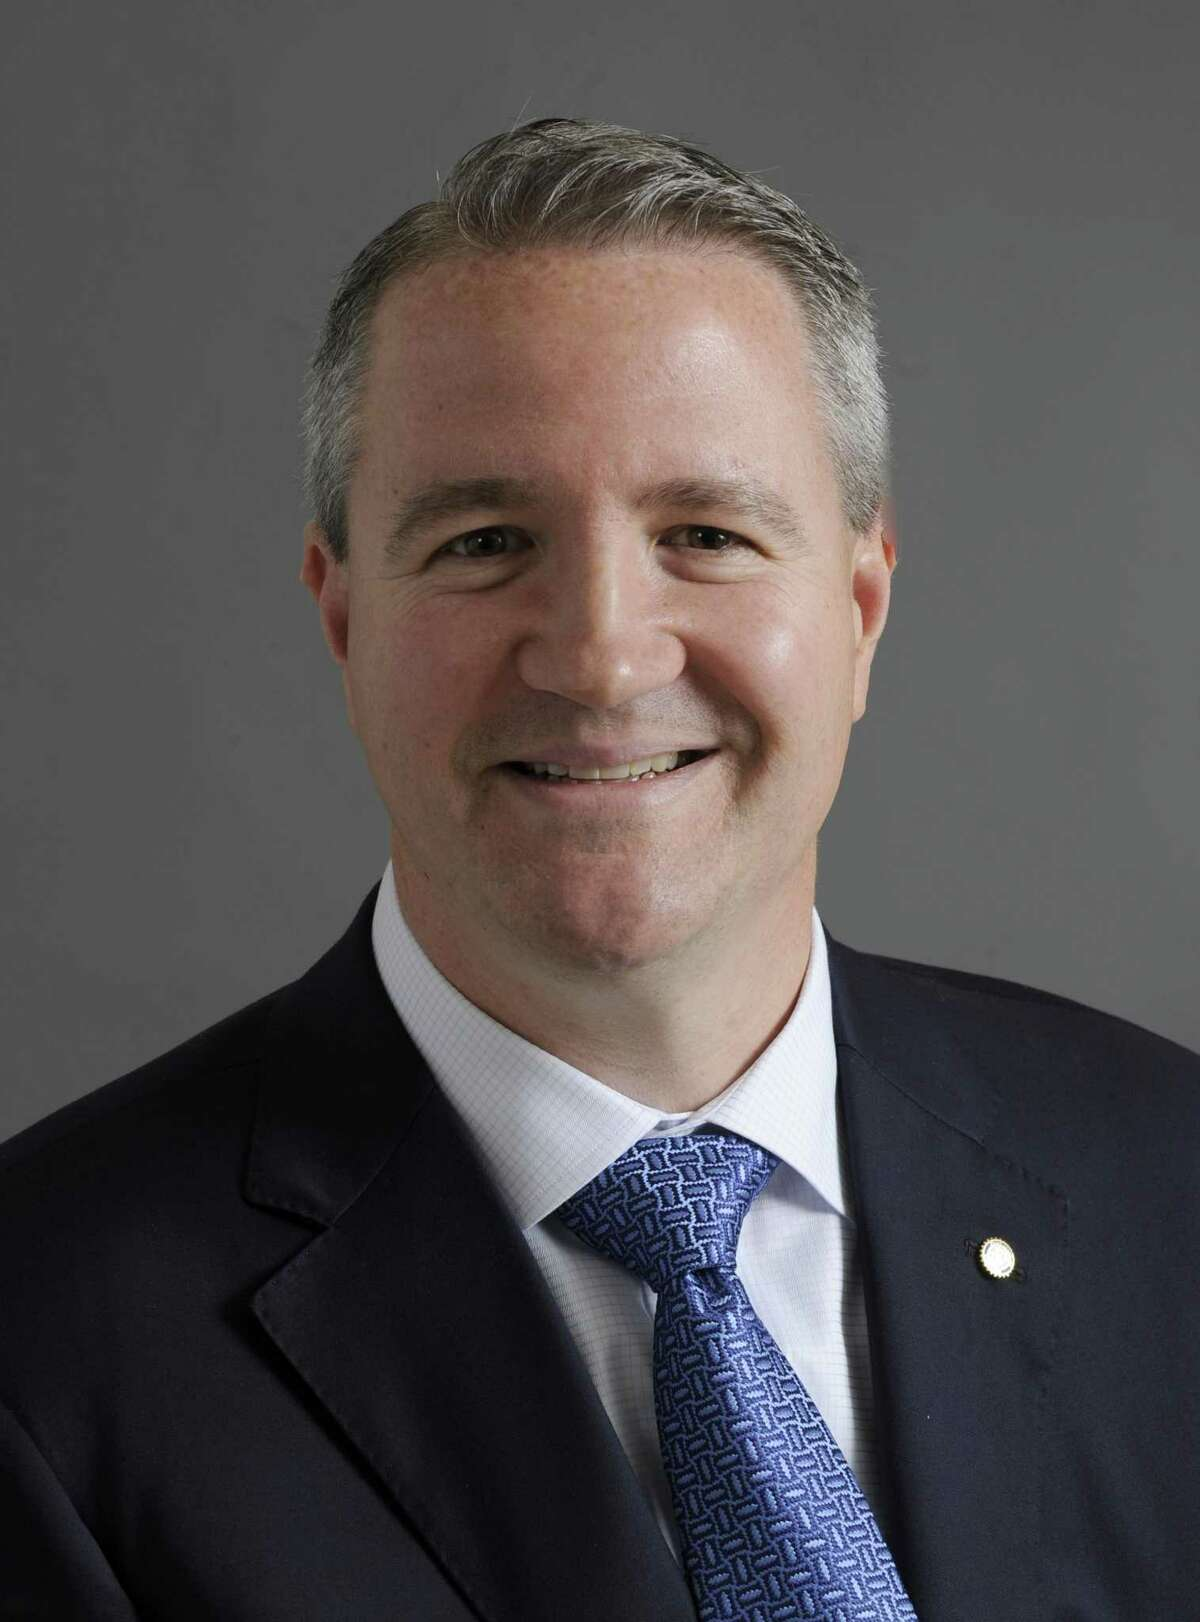 Daniel Rosenthal, Democrat, was elected first selectman in Newtown.